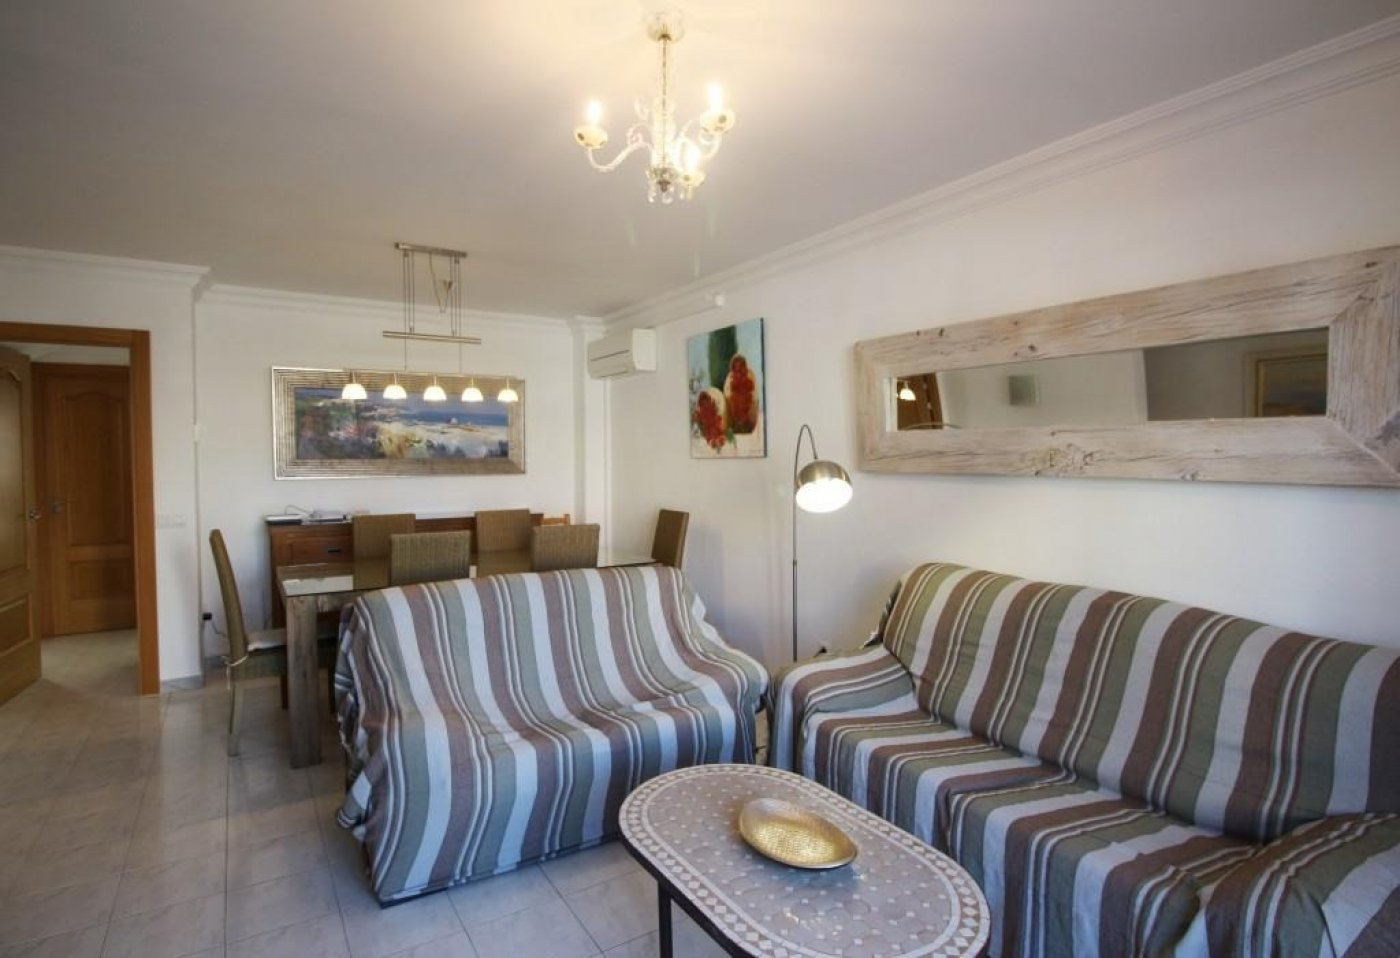 house en colonia-de-sant-jordi · colonia-de-sant-jordi 1100€